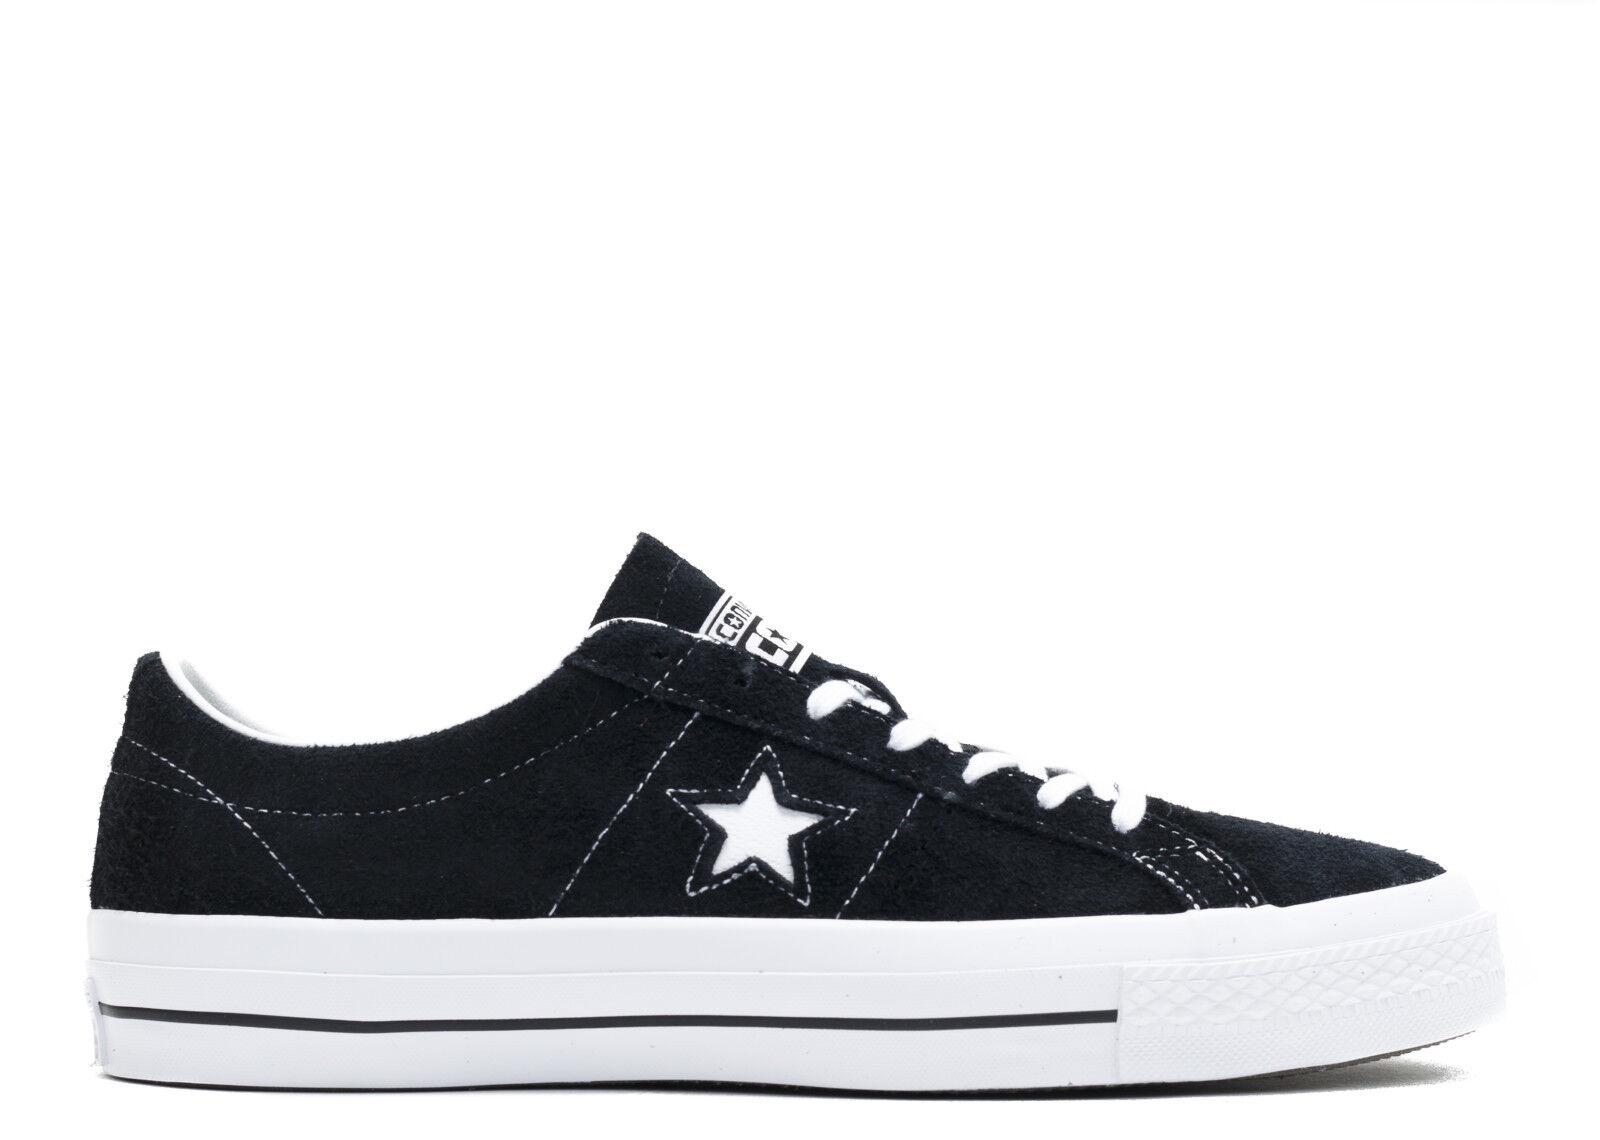 NUOVO Converse One Star Ox In In In Pelle Scamosciata Scarpe da ginnastica    neri in pelle scamosciata scarpe Le Fleur | Vendite Online  d4260b